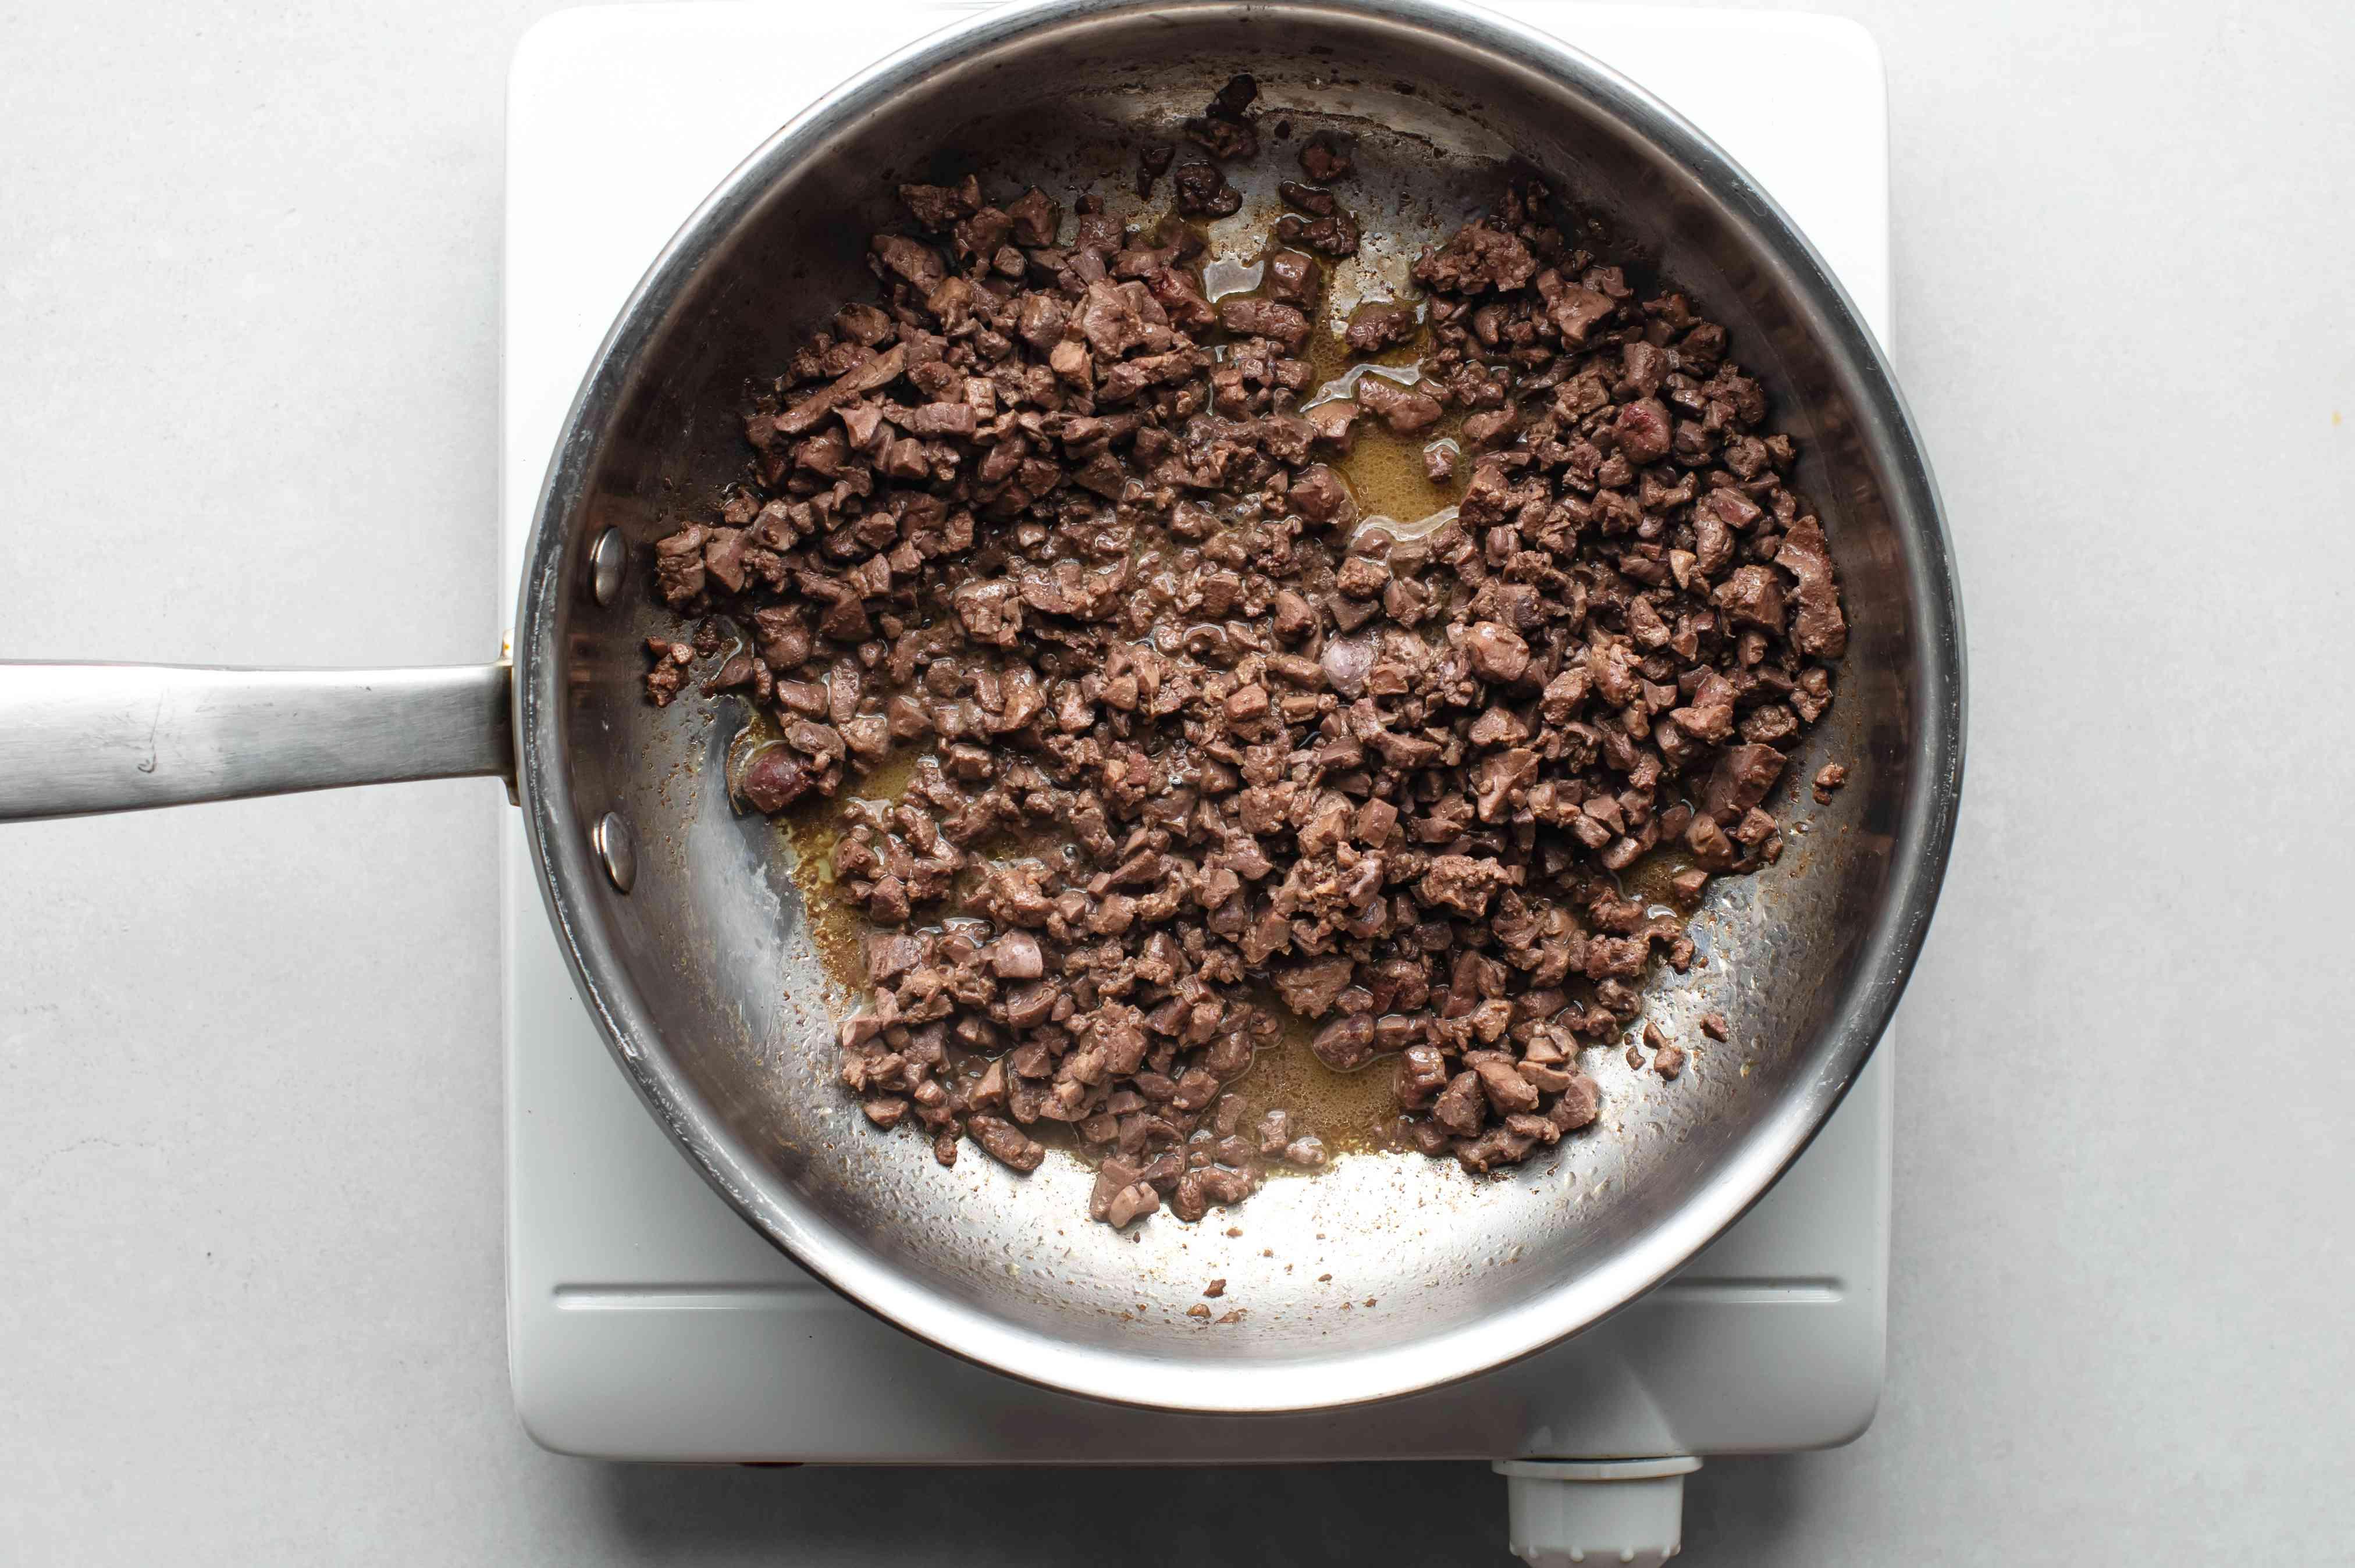 Sauté chicken livers in a pan